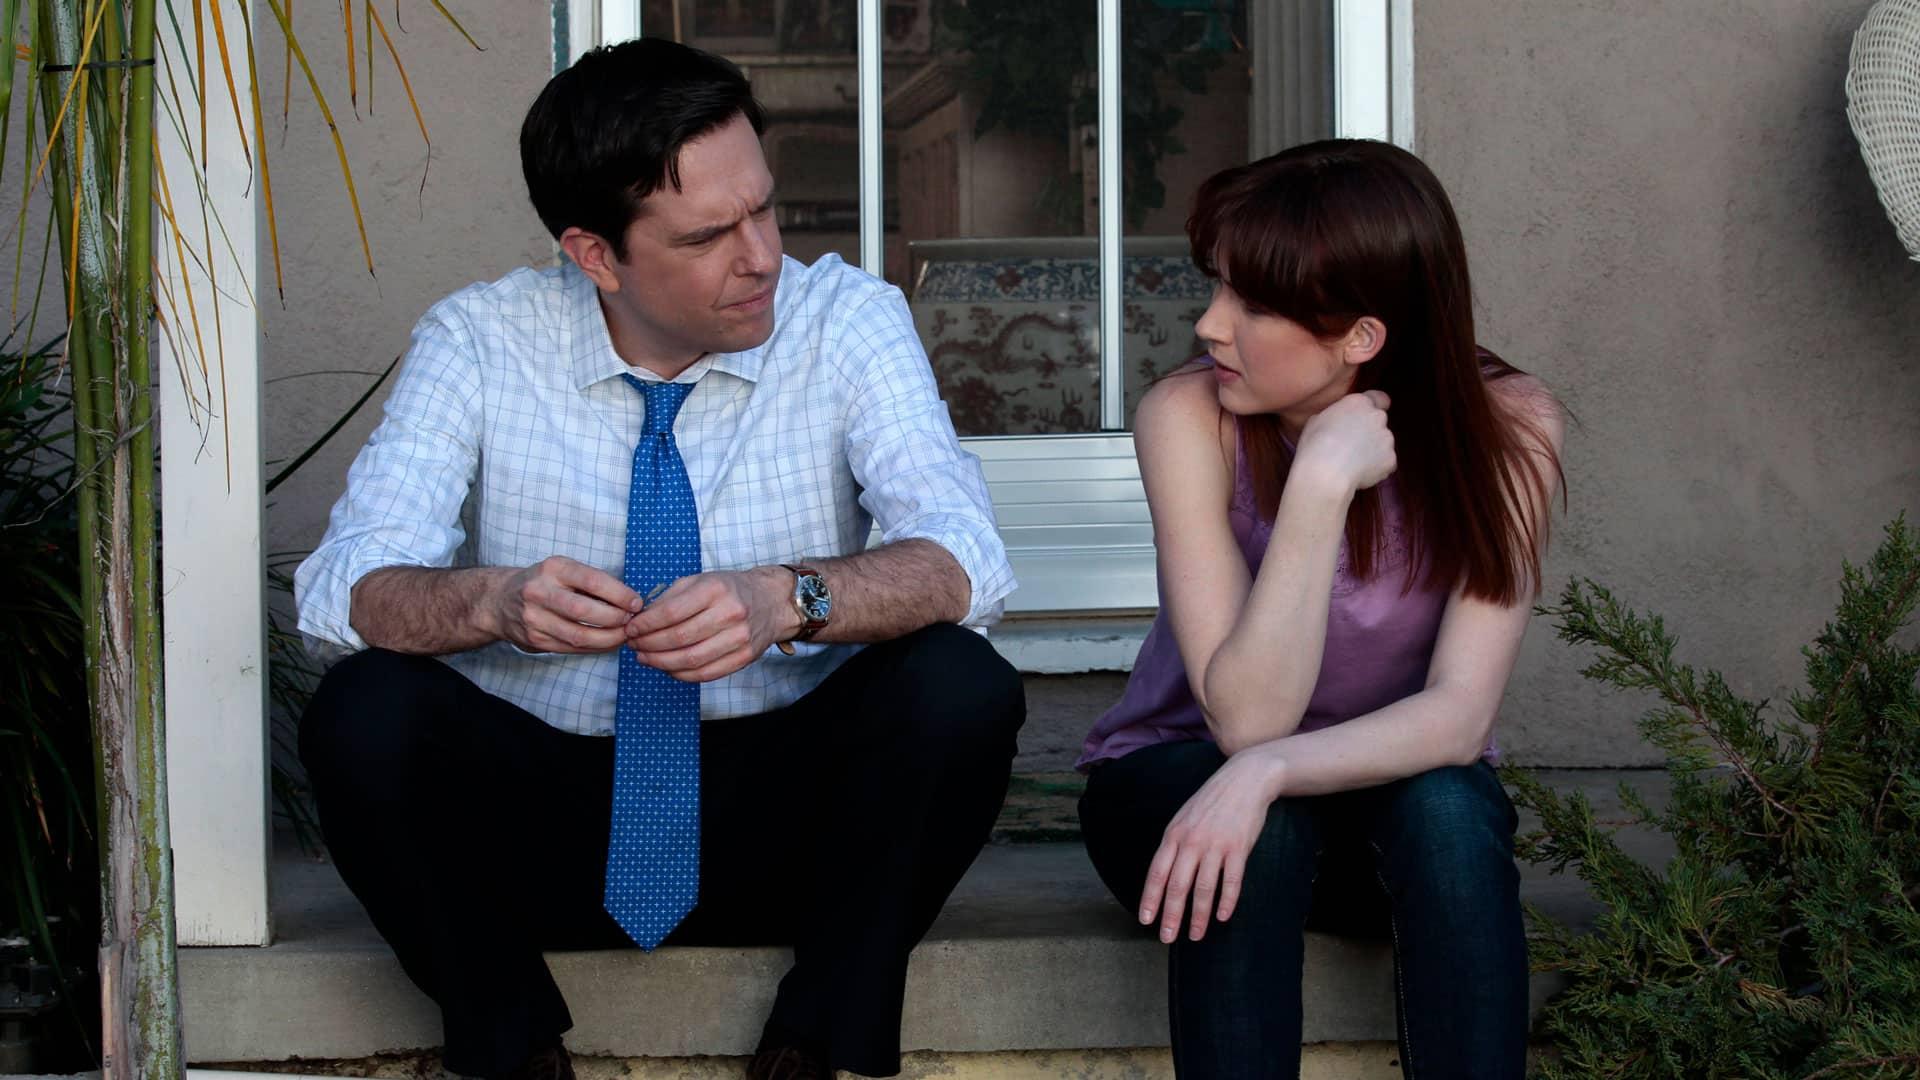 blandede signaler fra en jente jeg er dating hva galt med dating din beste venn